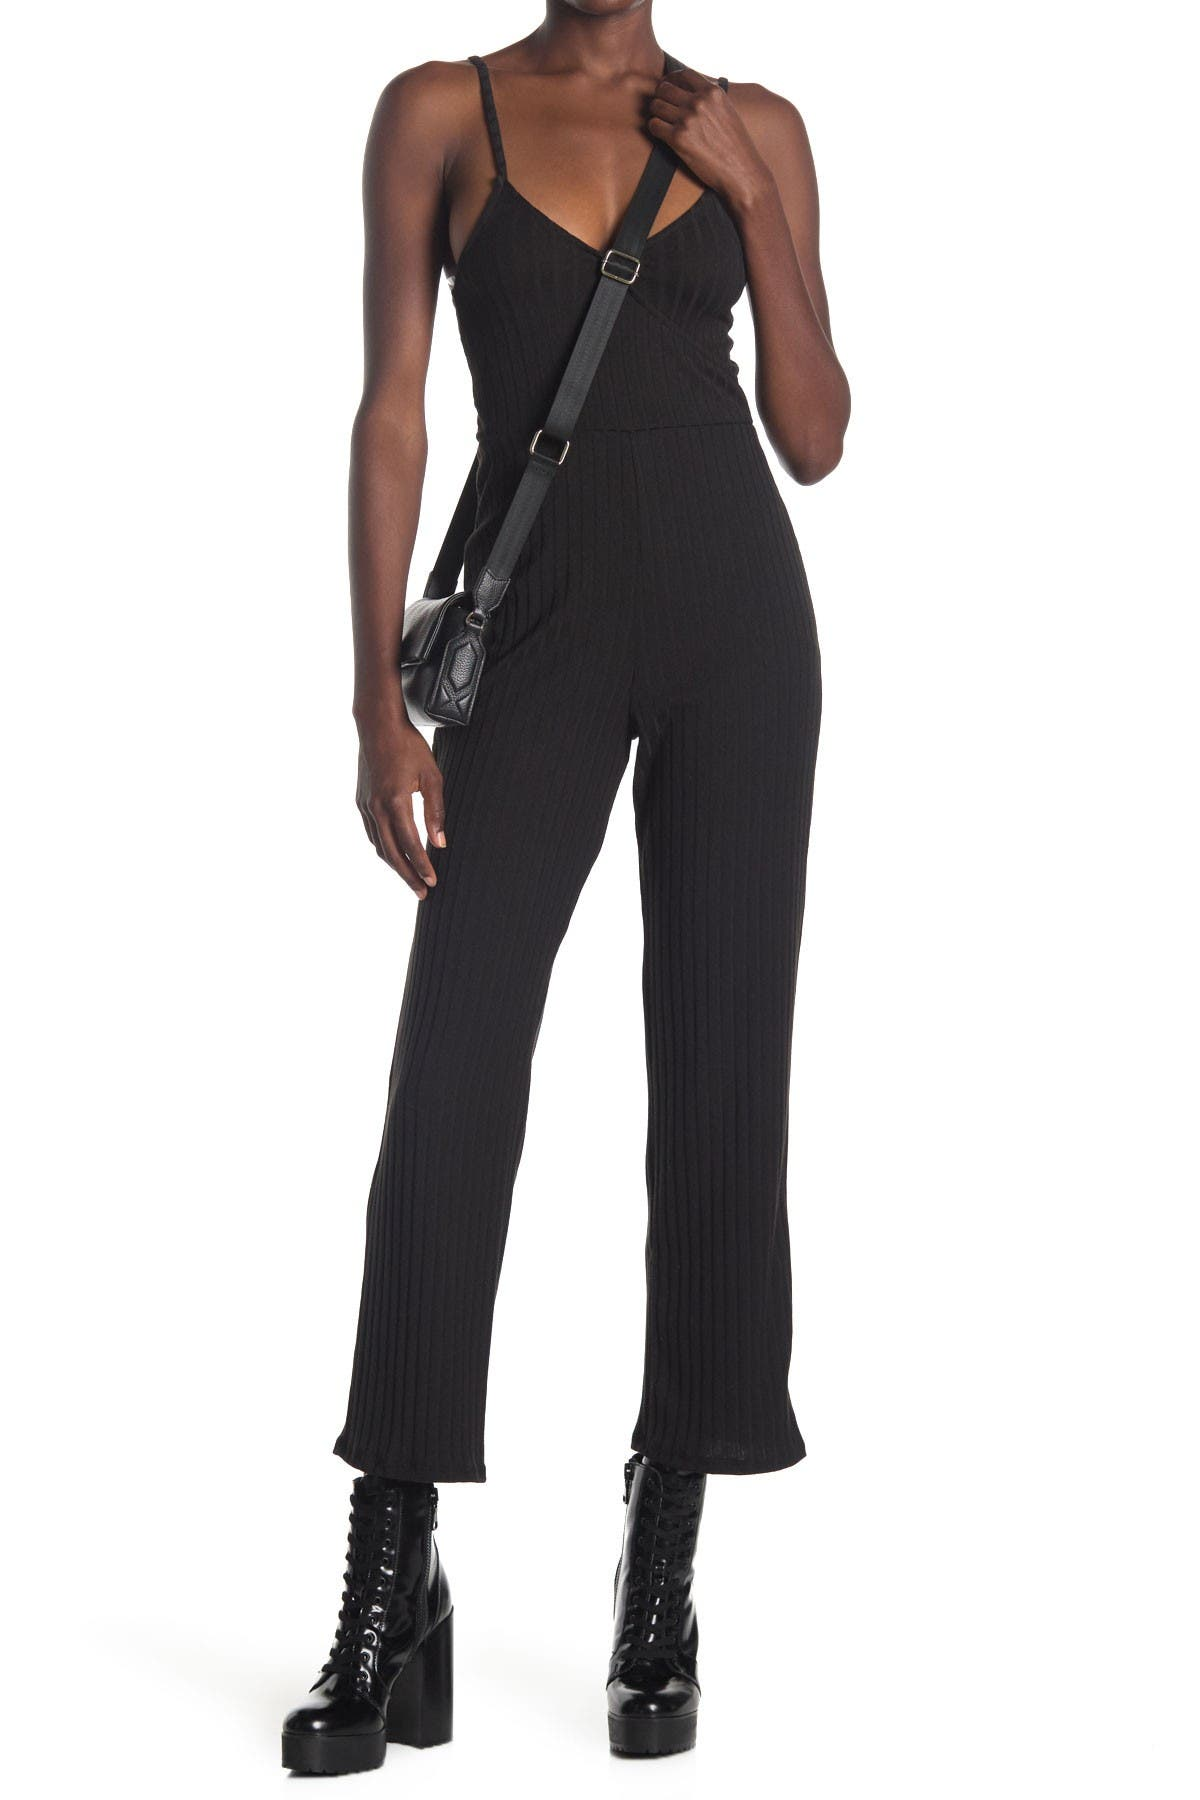 Image of Velvet Torch V-Neck Ribbed Jumpsuit